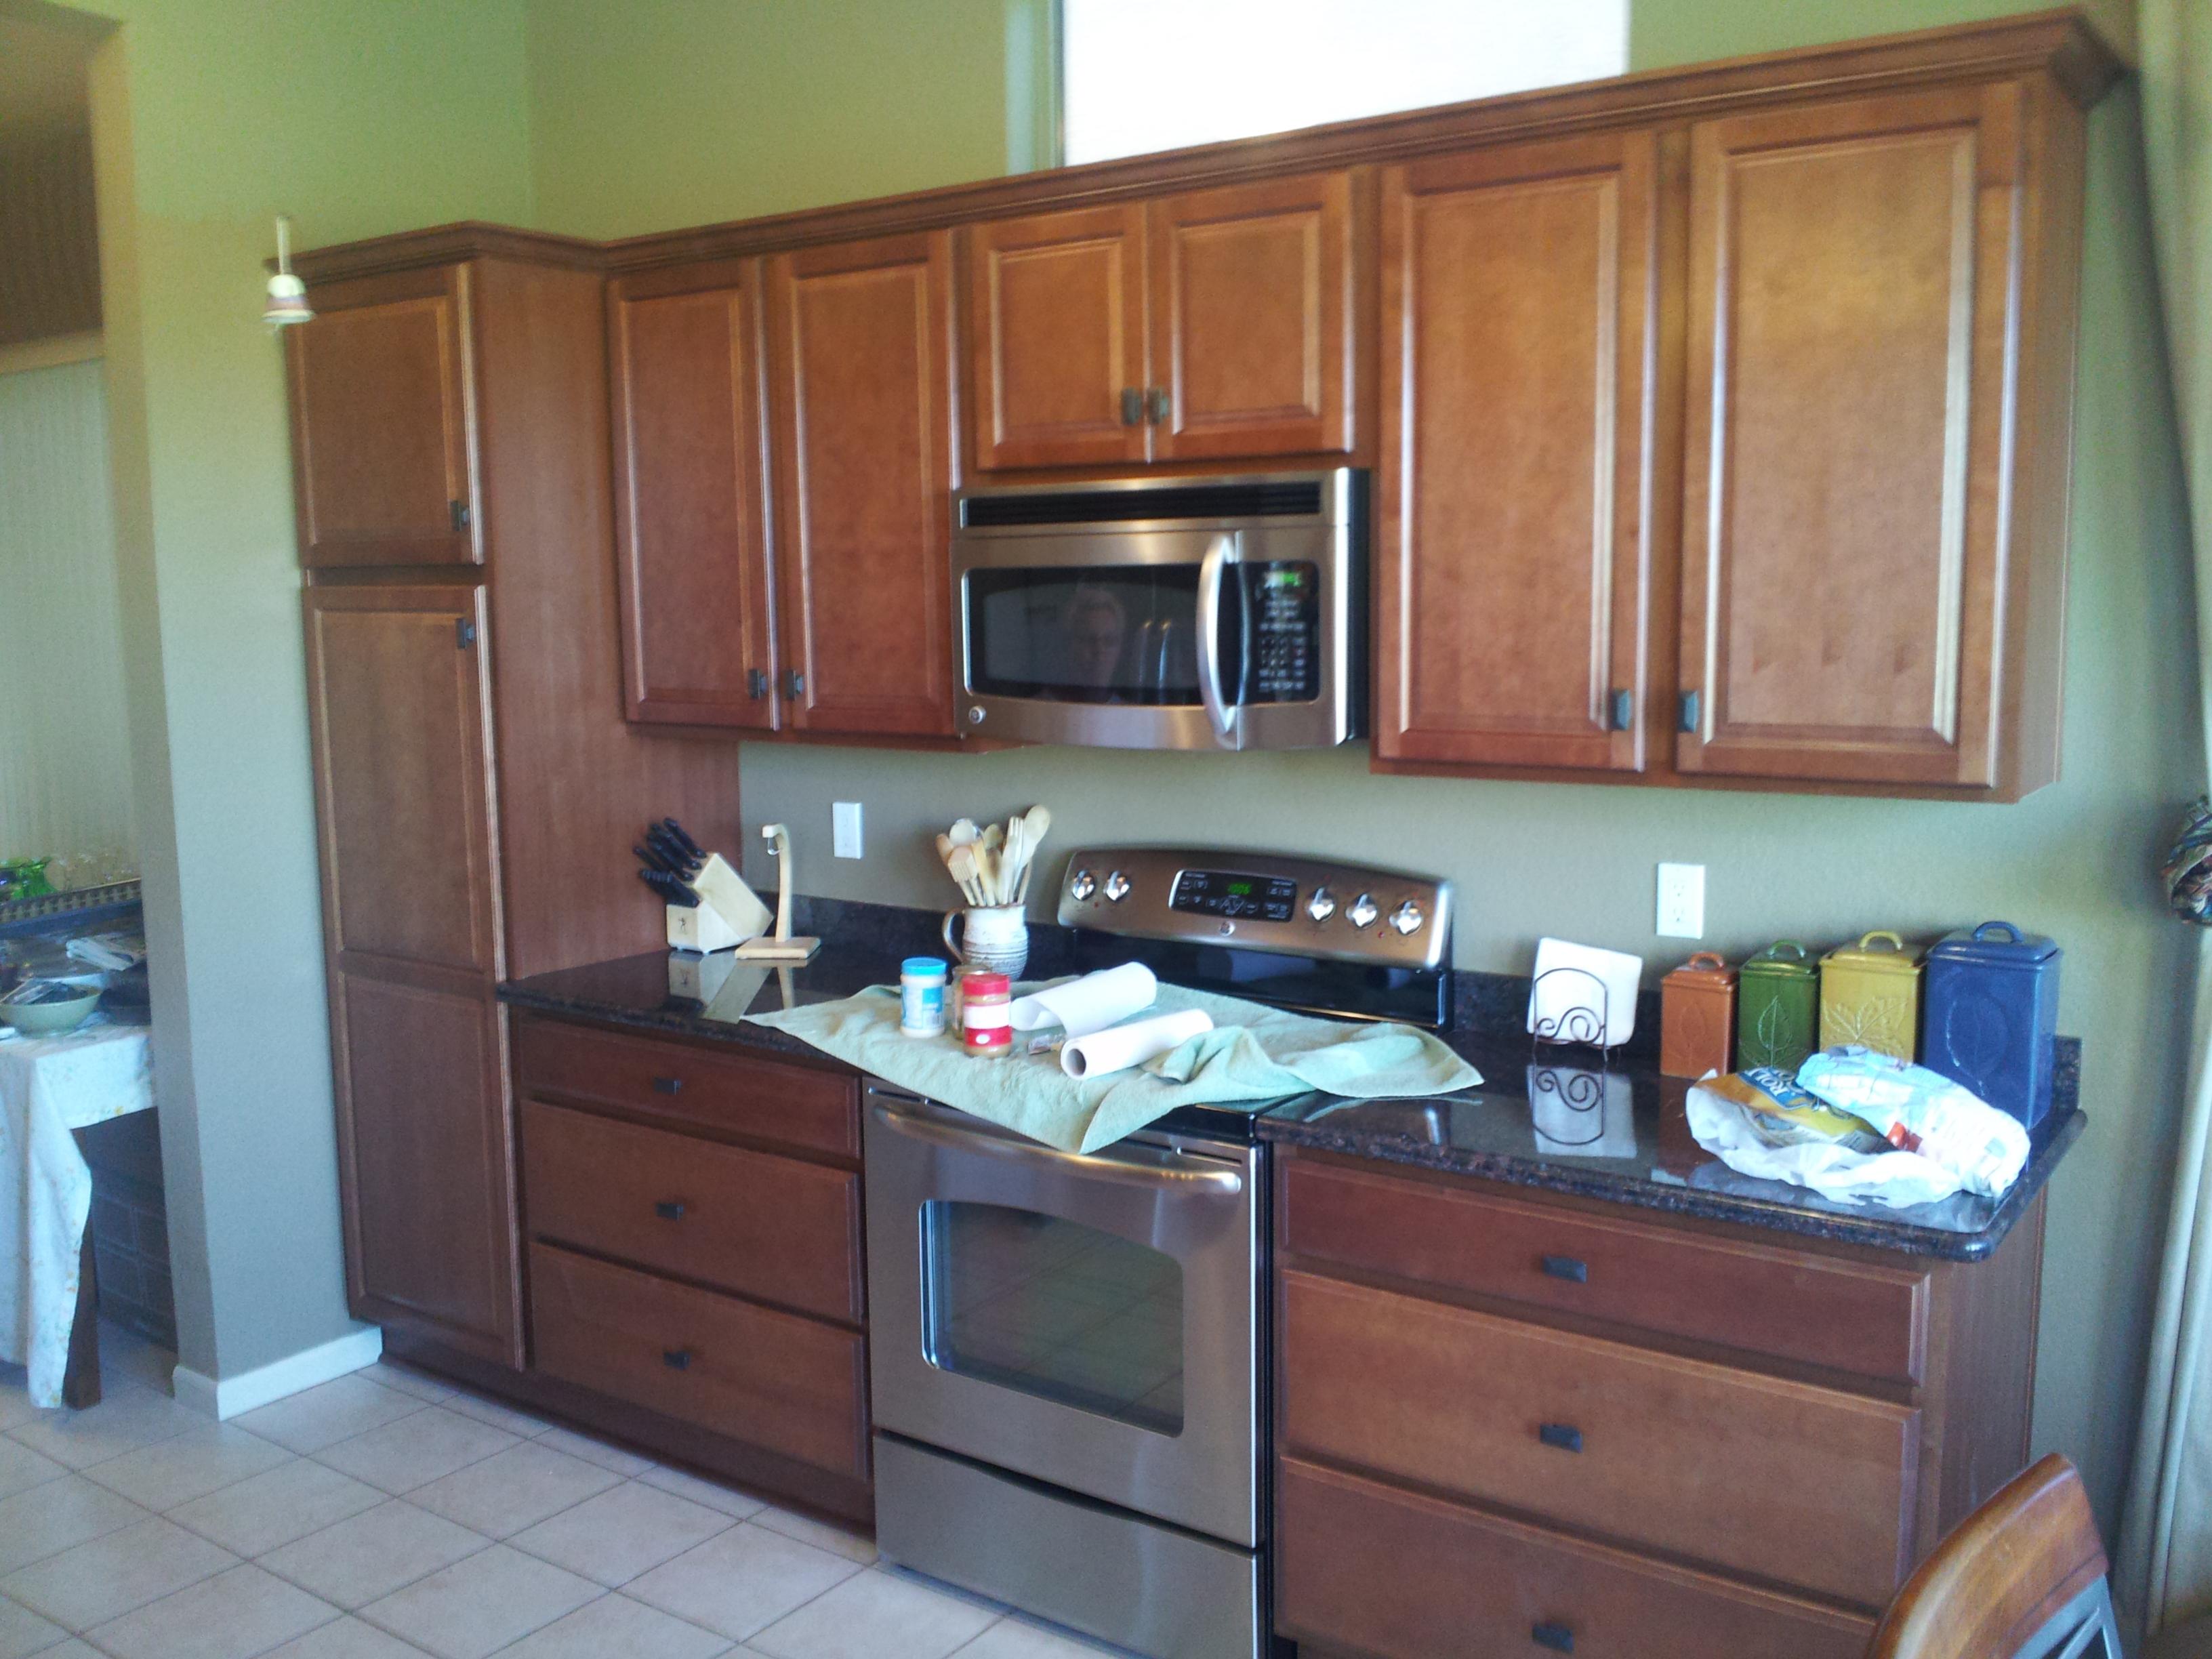 2 kitchen remodel scottsdale Remodeled kitchen Phoenix